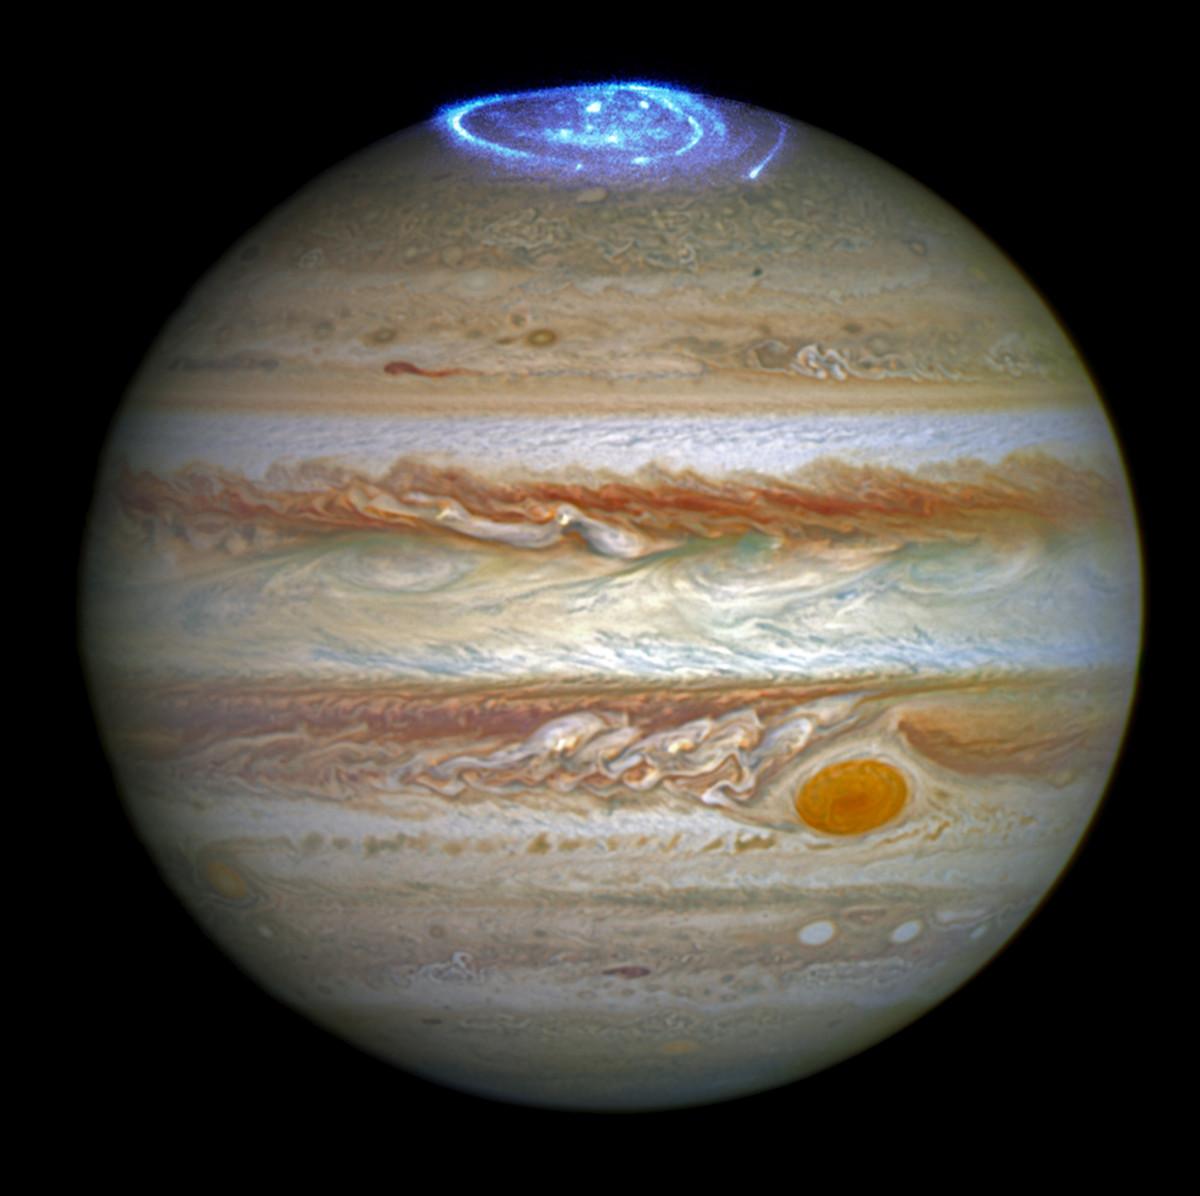 Jupiter and Its Moons, an Exploration History